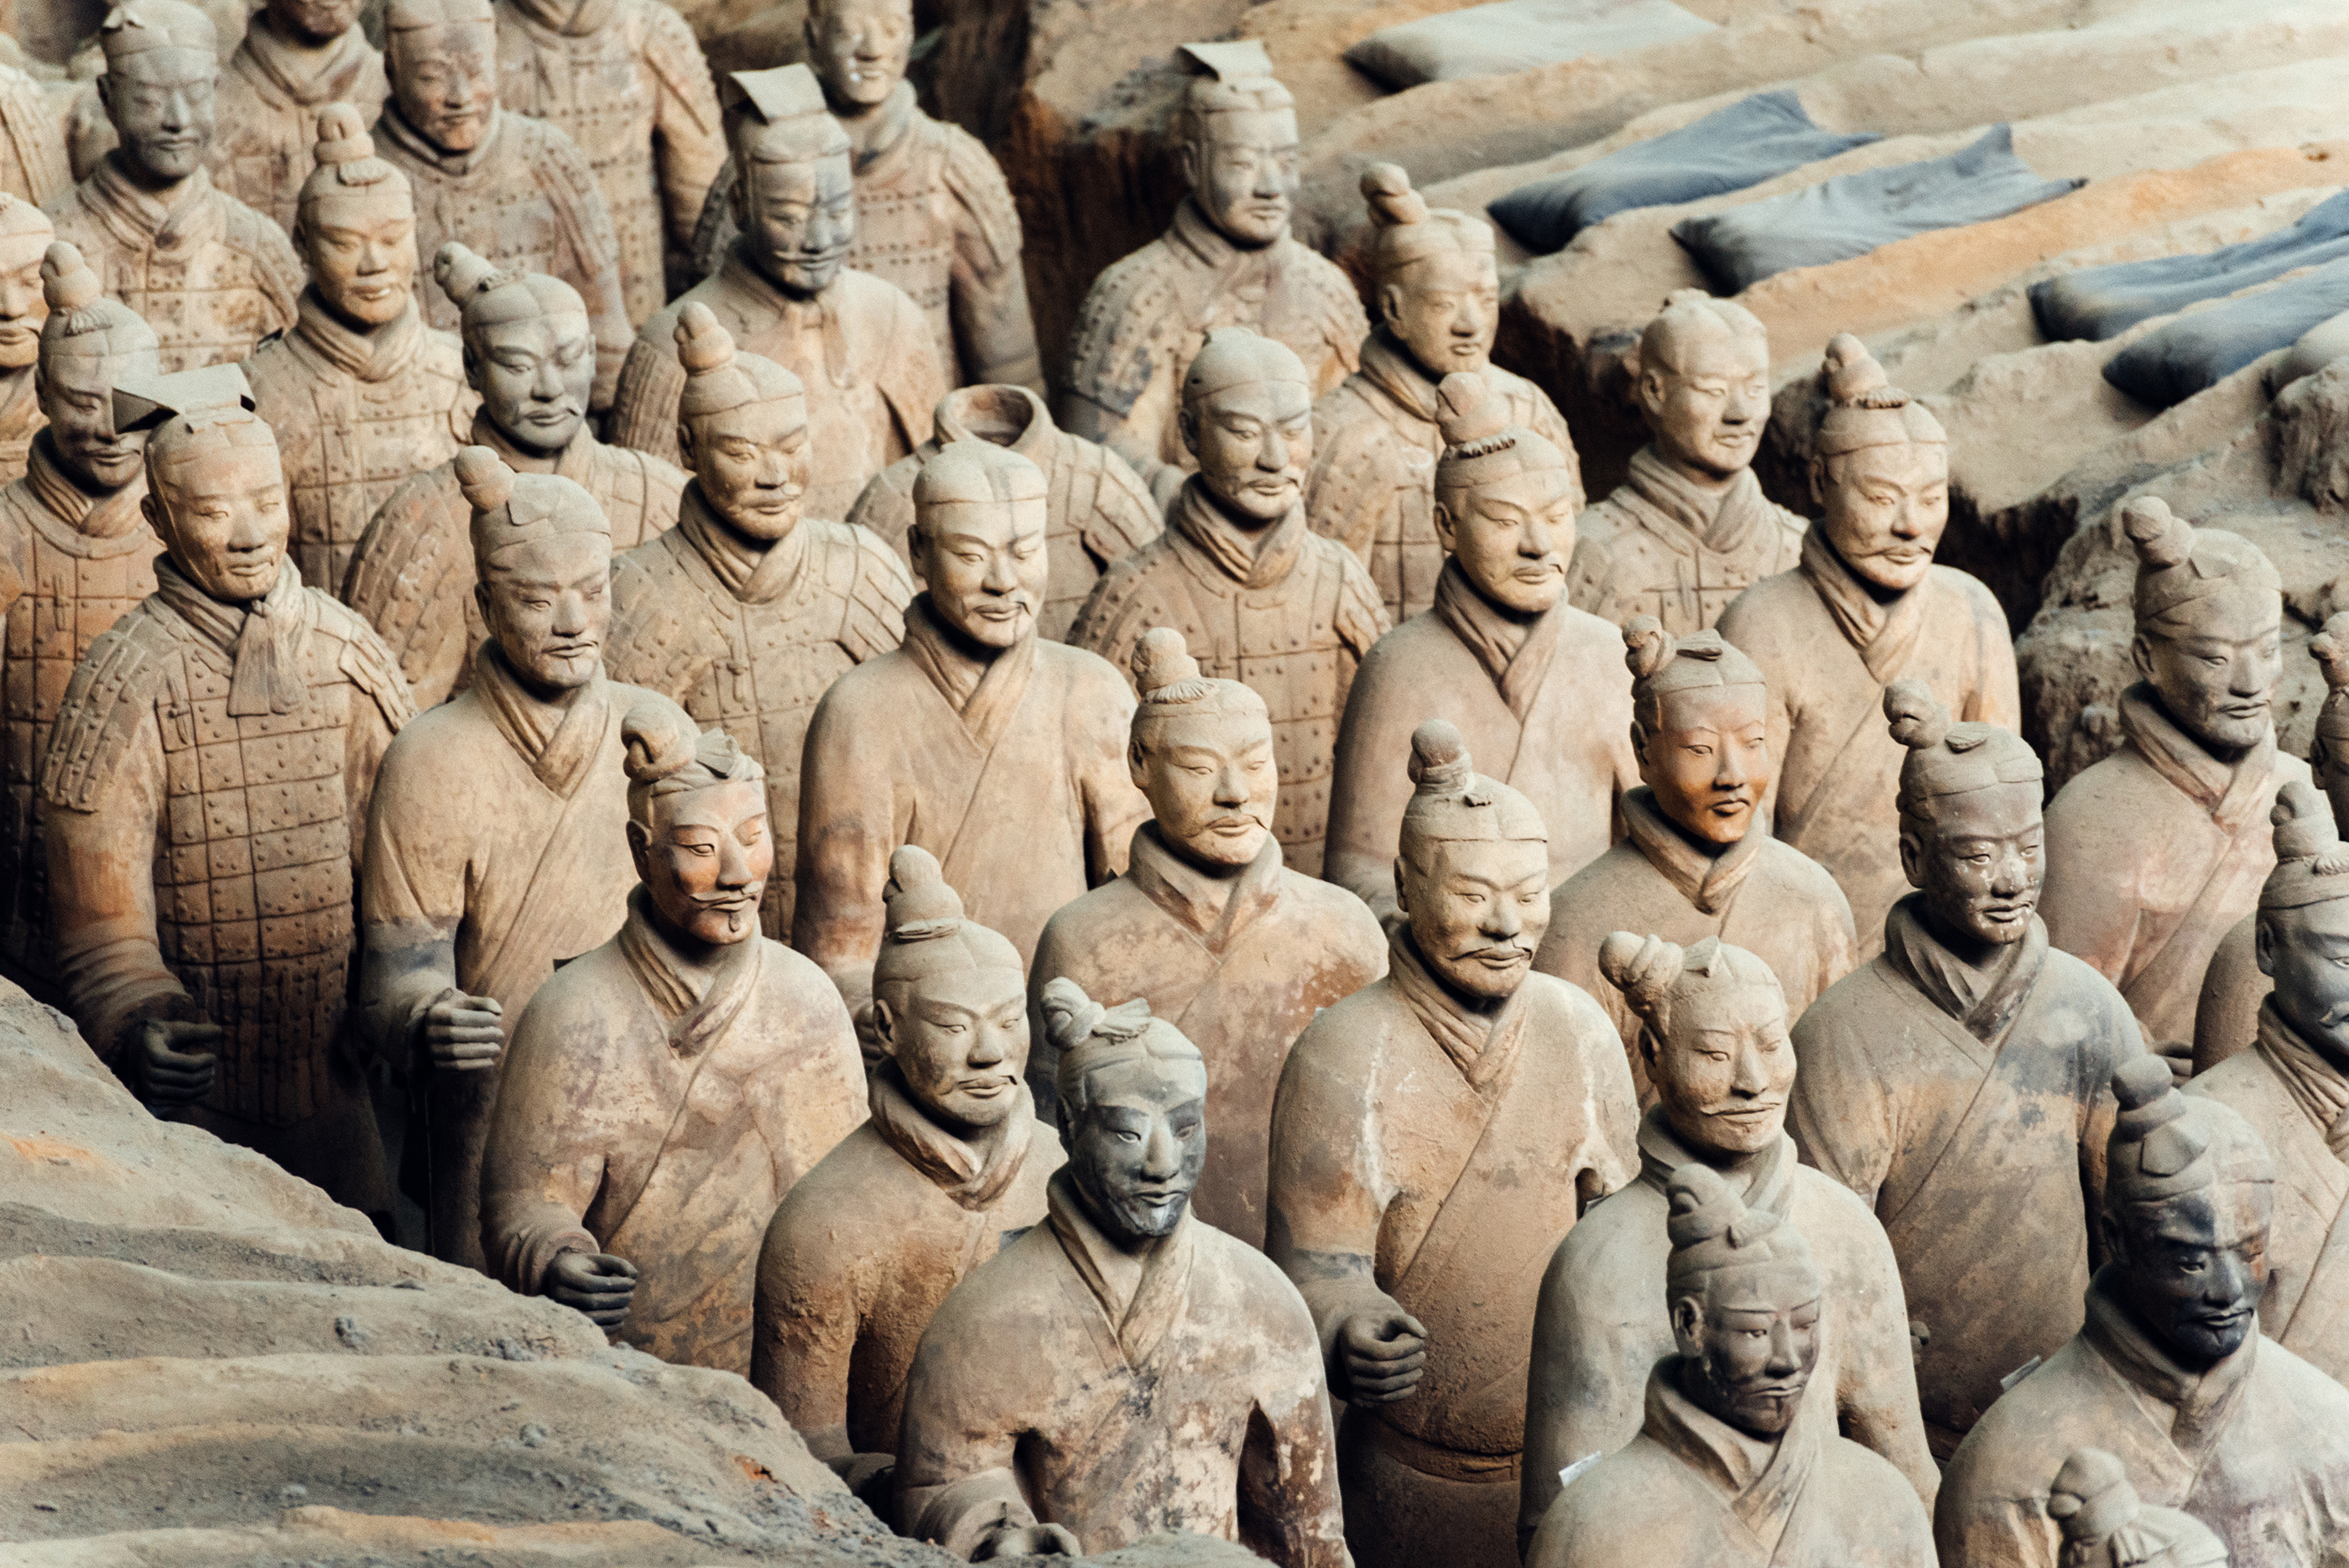 Terracotta Army in Xian, China